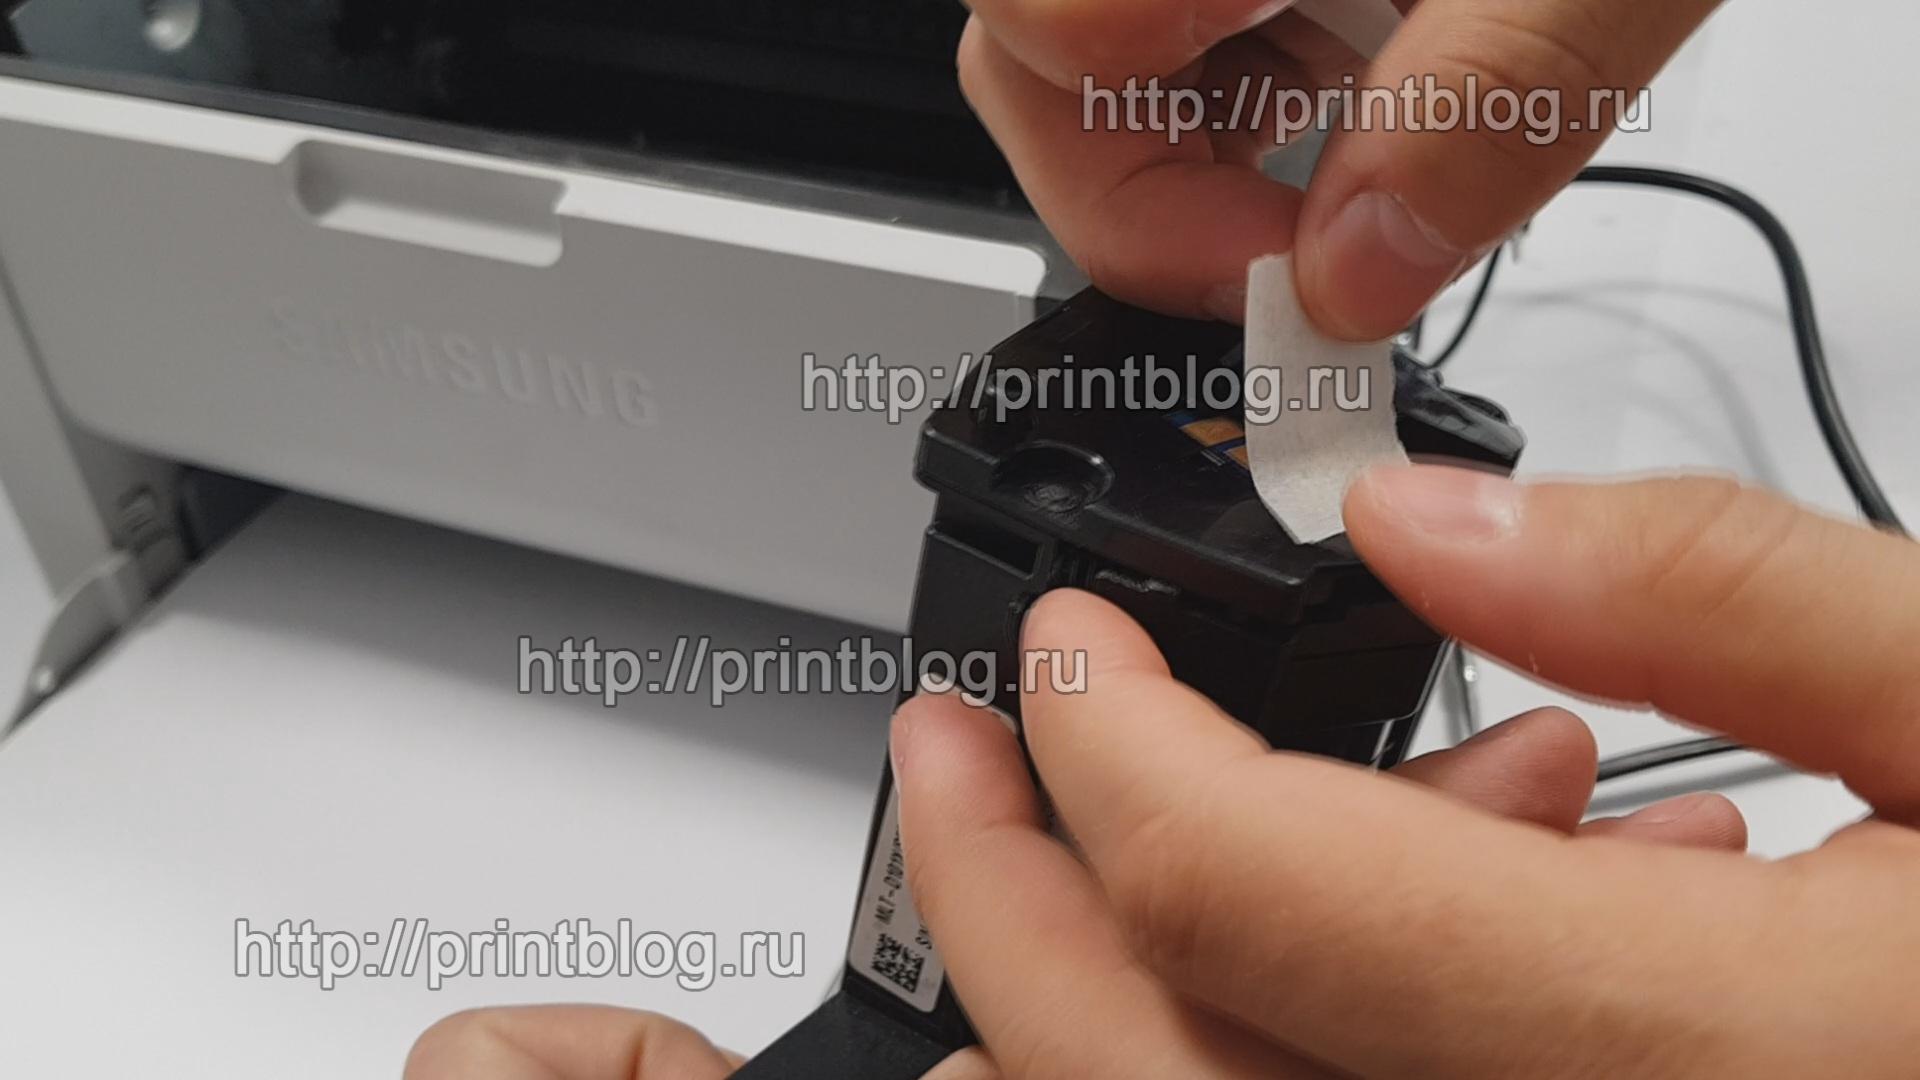 Прошивка Samsung Xpress M2020W, M2026W, M2020, M2026. Зачем Как